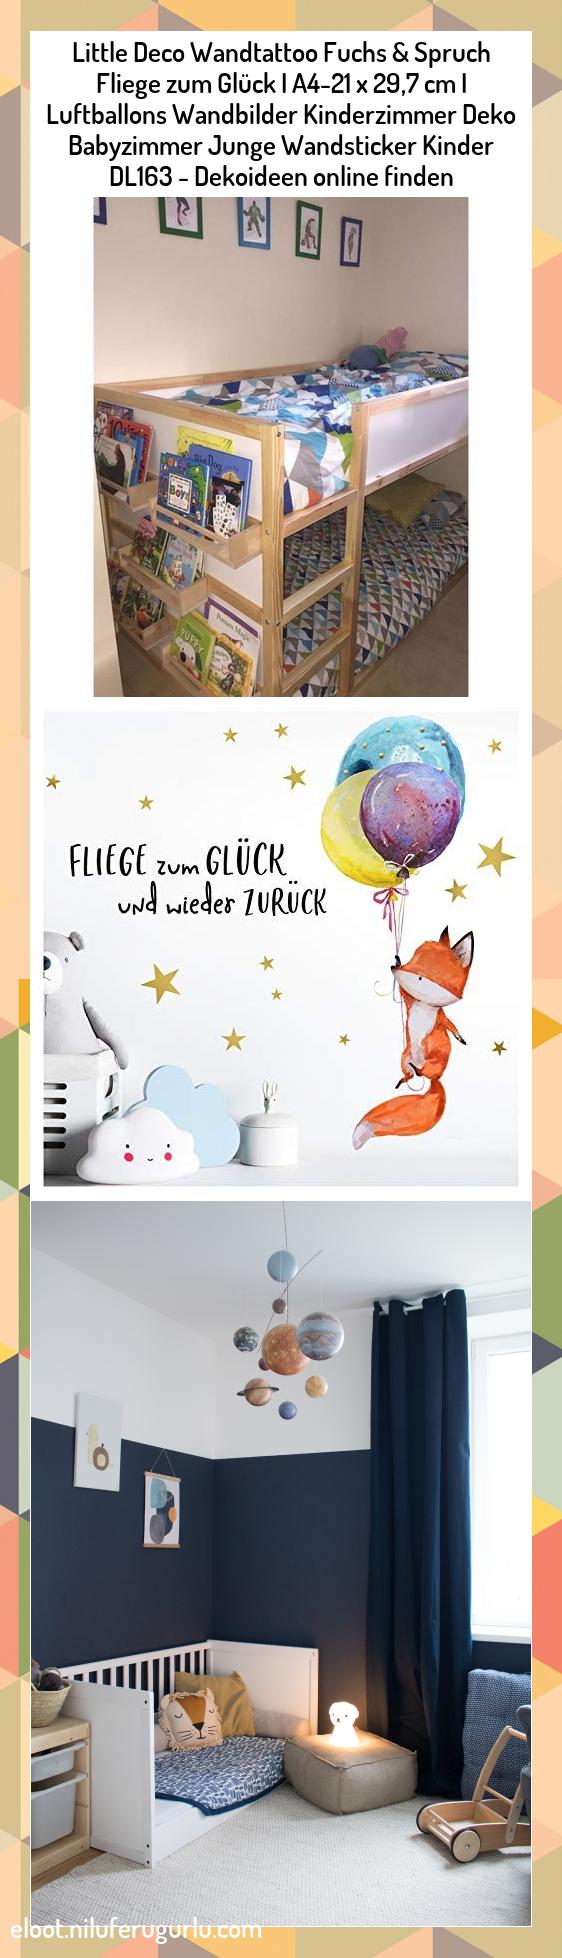 Little Deco Wandtattoo Fuchs /& Spruch Fliege zum Gl/ück I A4-21 x 29,7 cm I Luftballons Wandbilder Kinderzimmer Deko Babyzimmer Junge Wandsticker Kinder DL163